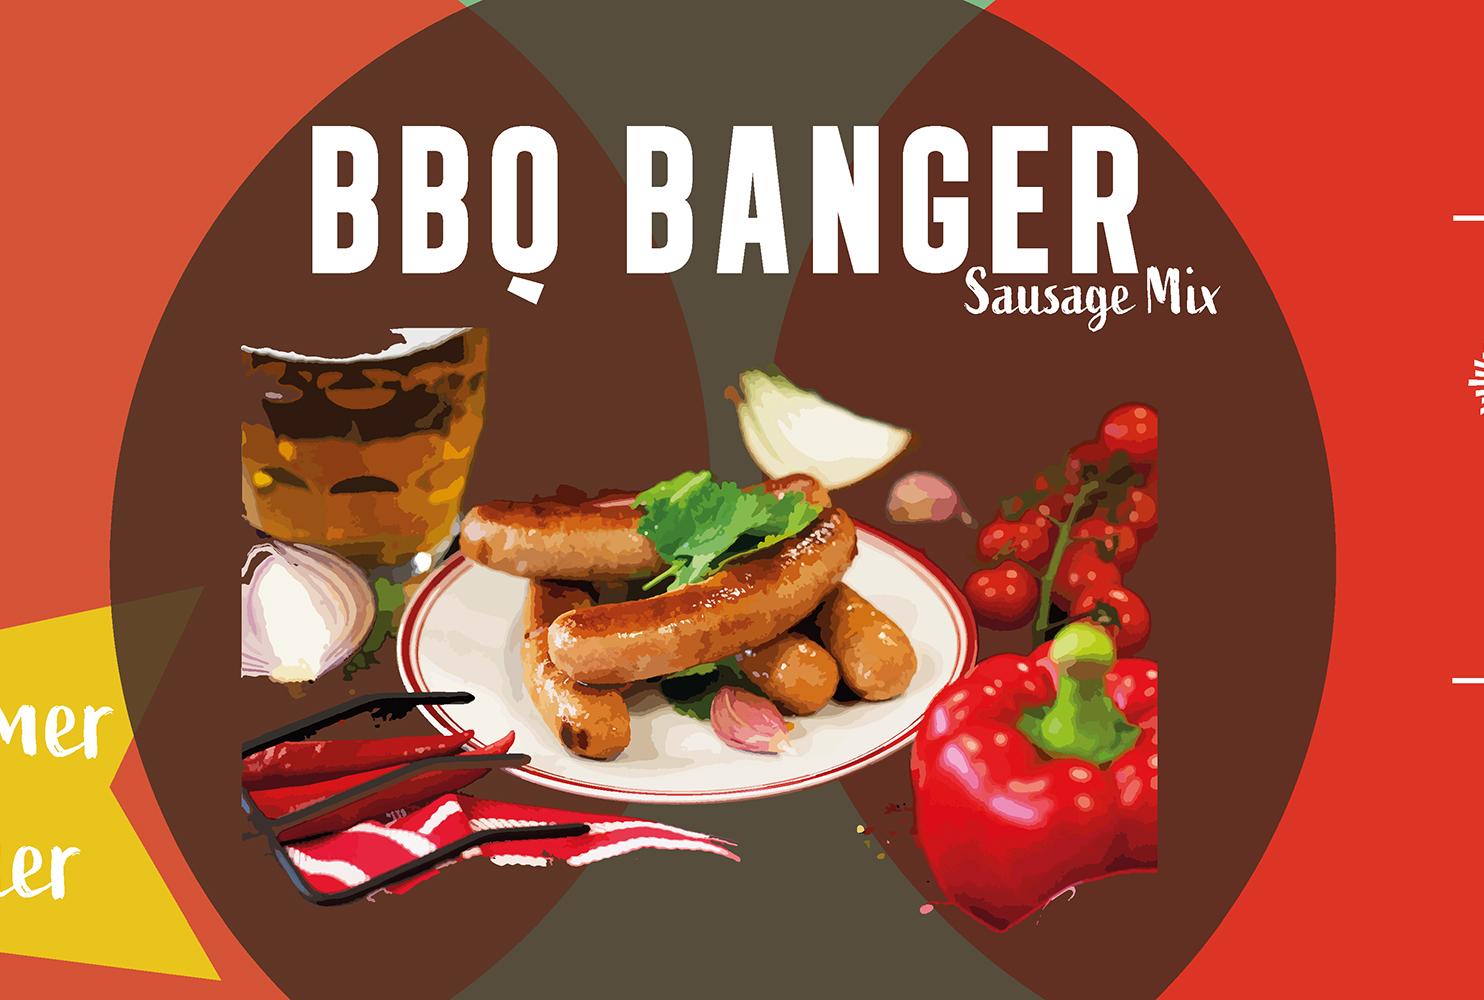 COUNTRY FAYRE BBQ BANGER SAUSAGE MIX